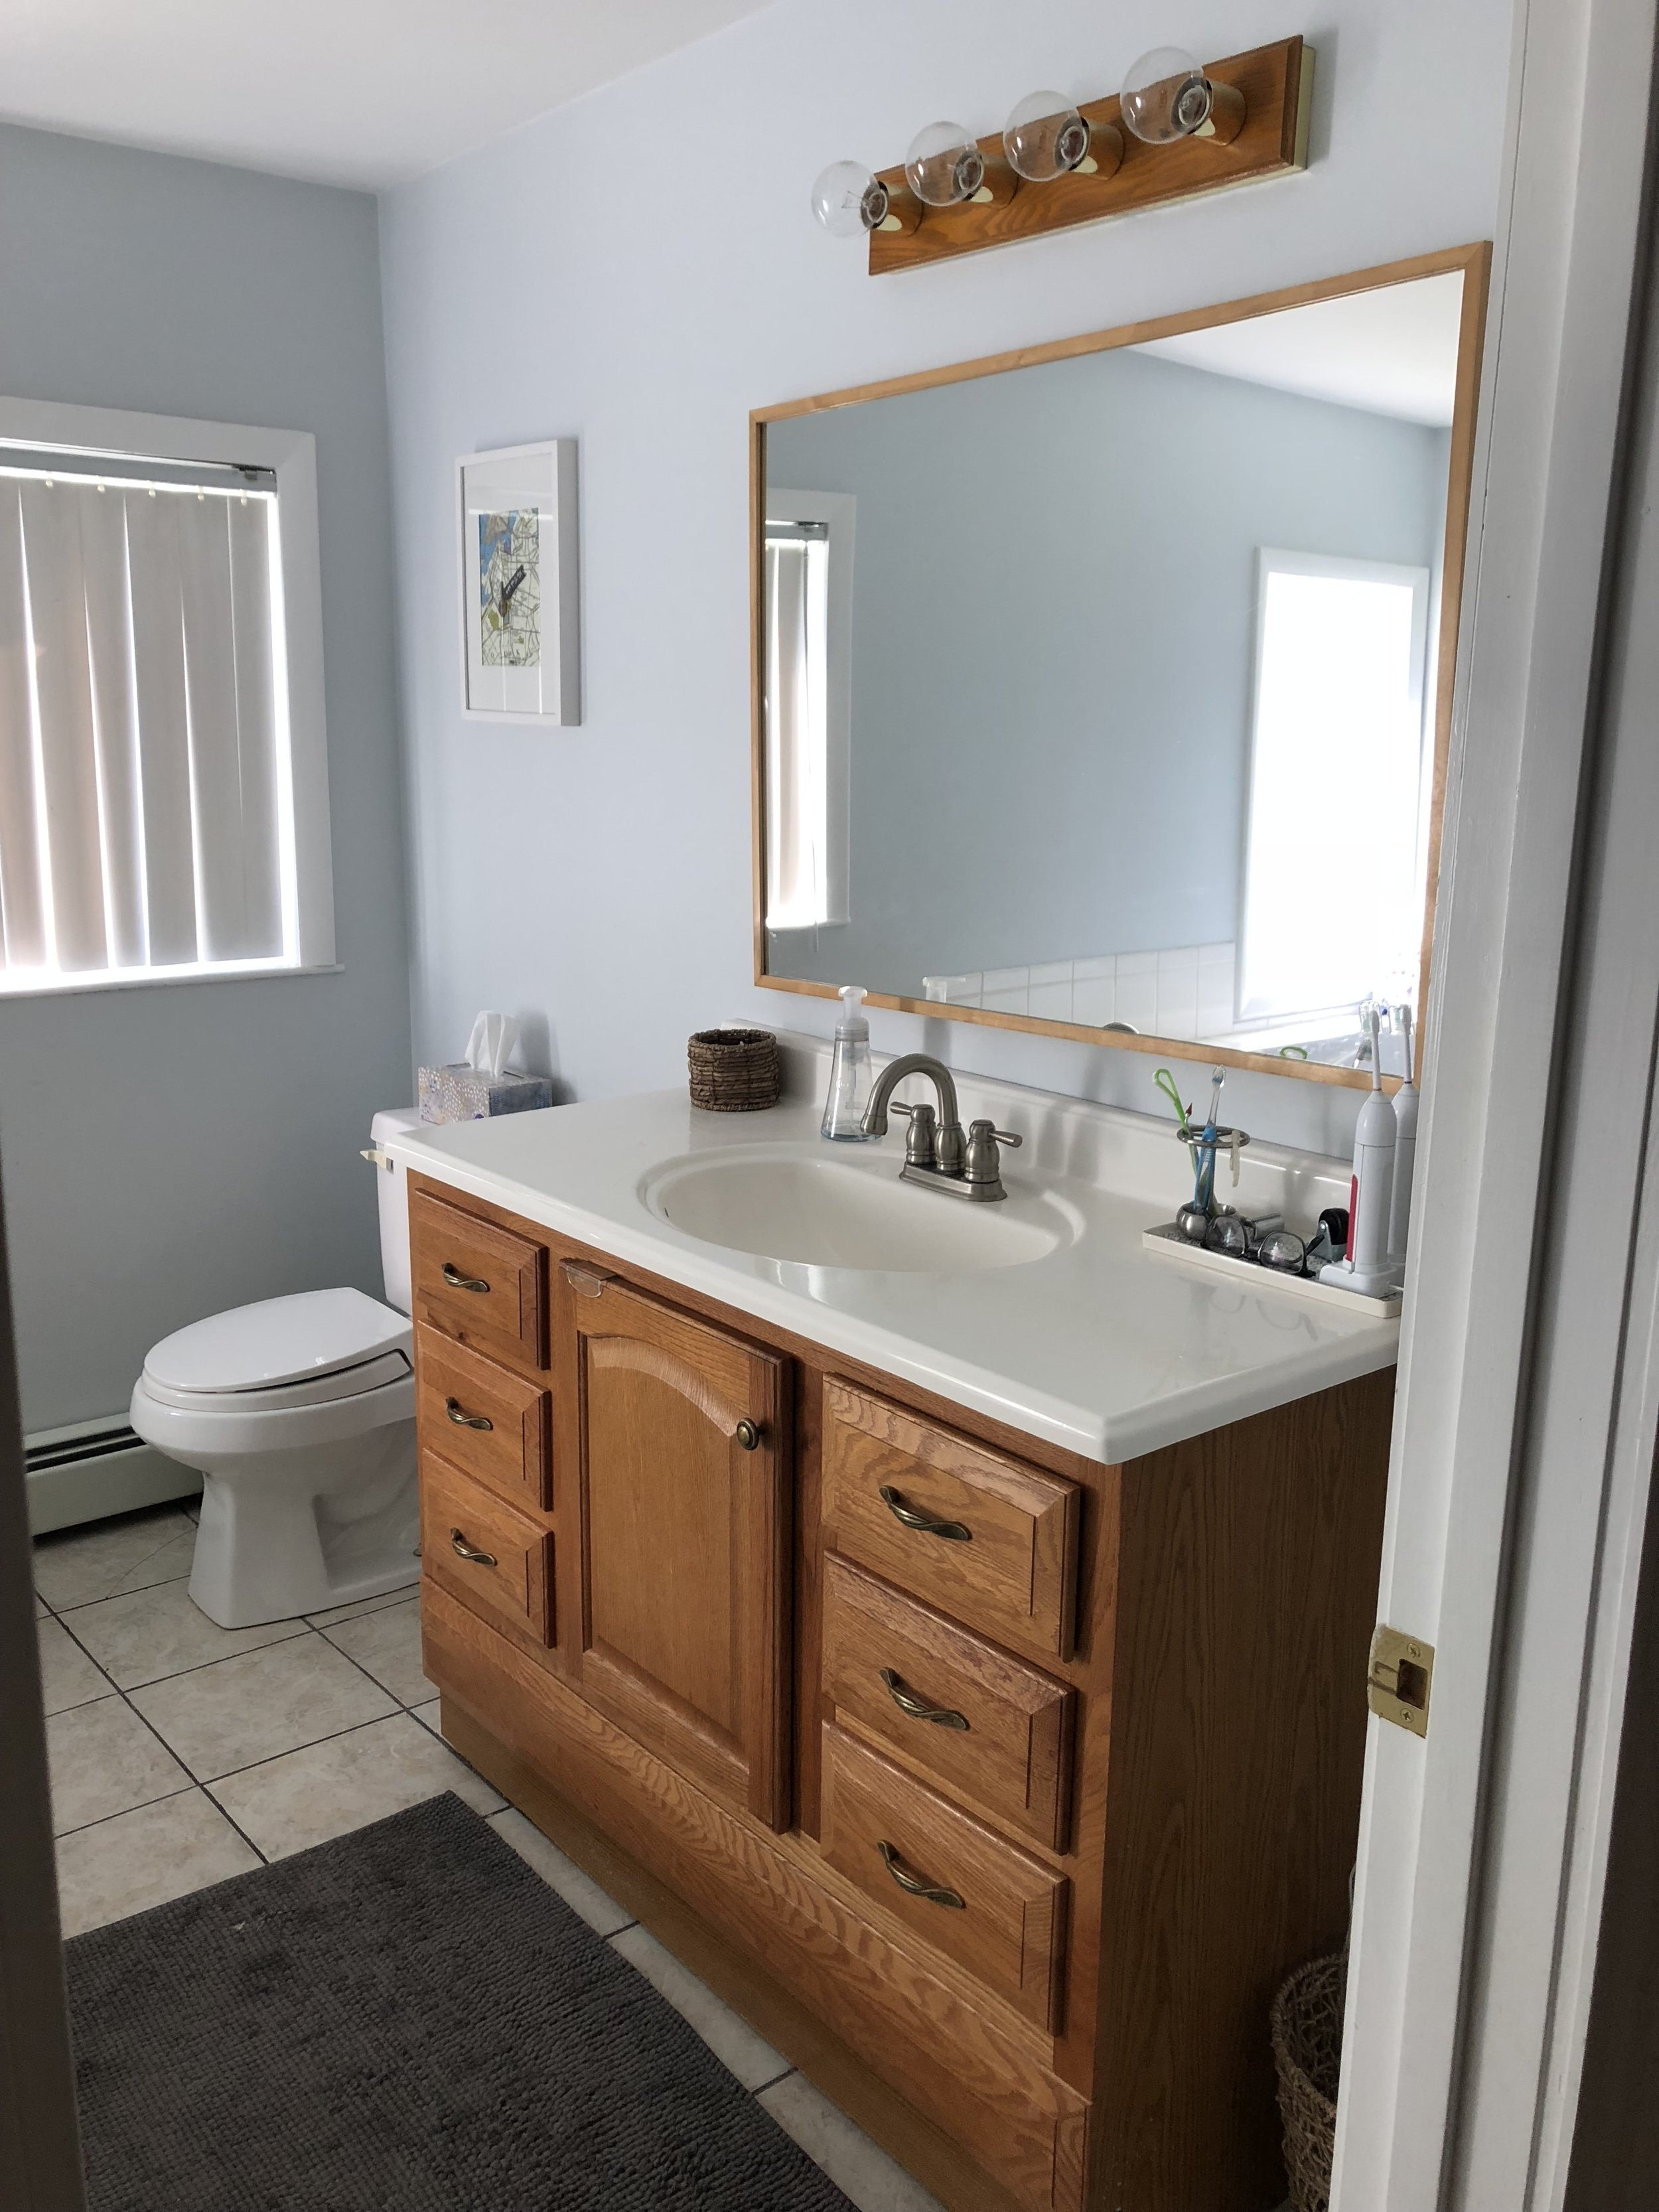 Gray Oak Studio - 2 Day 200 Dollars Challenge - Before Photo of Bathroom